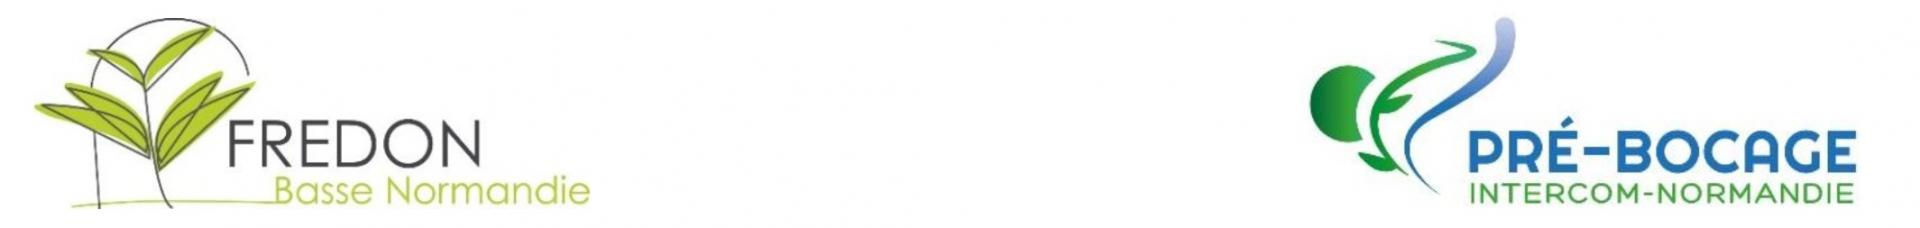 Logo fredon pbi